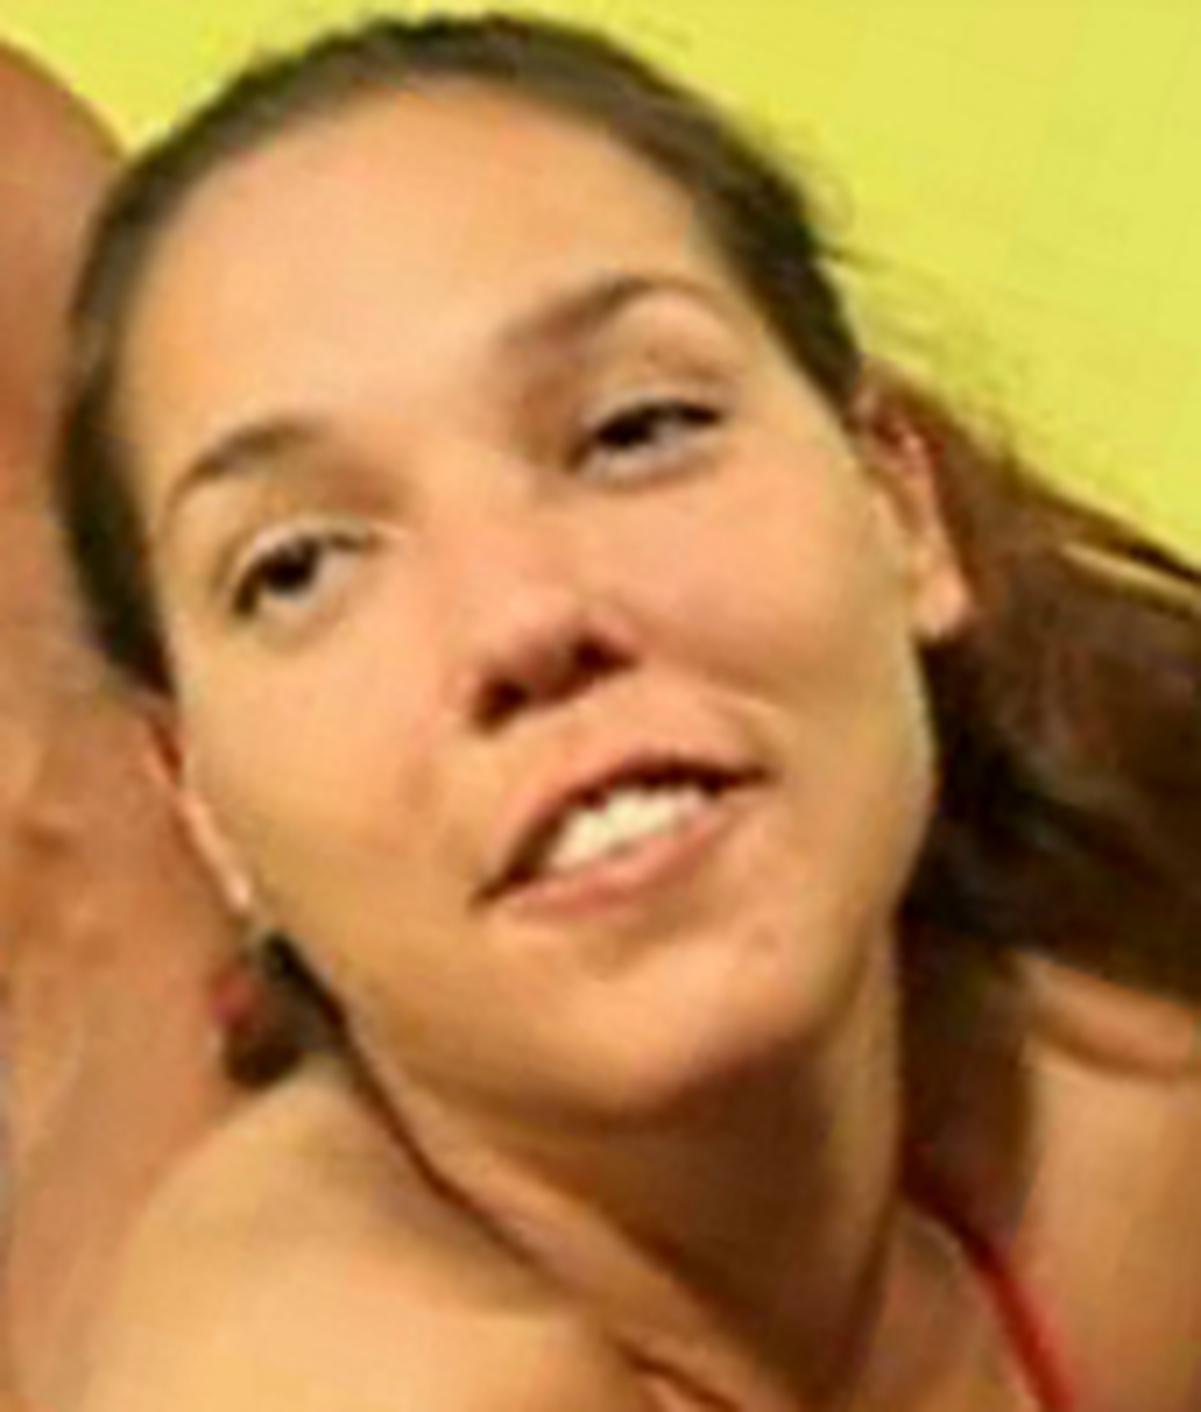 Andrea Borges